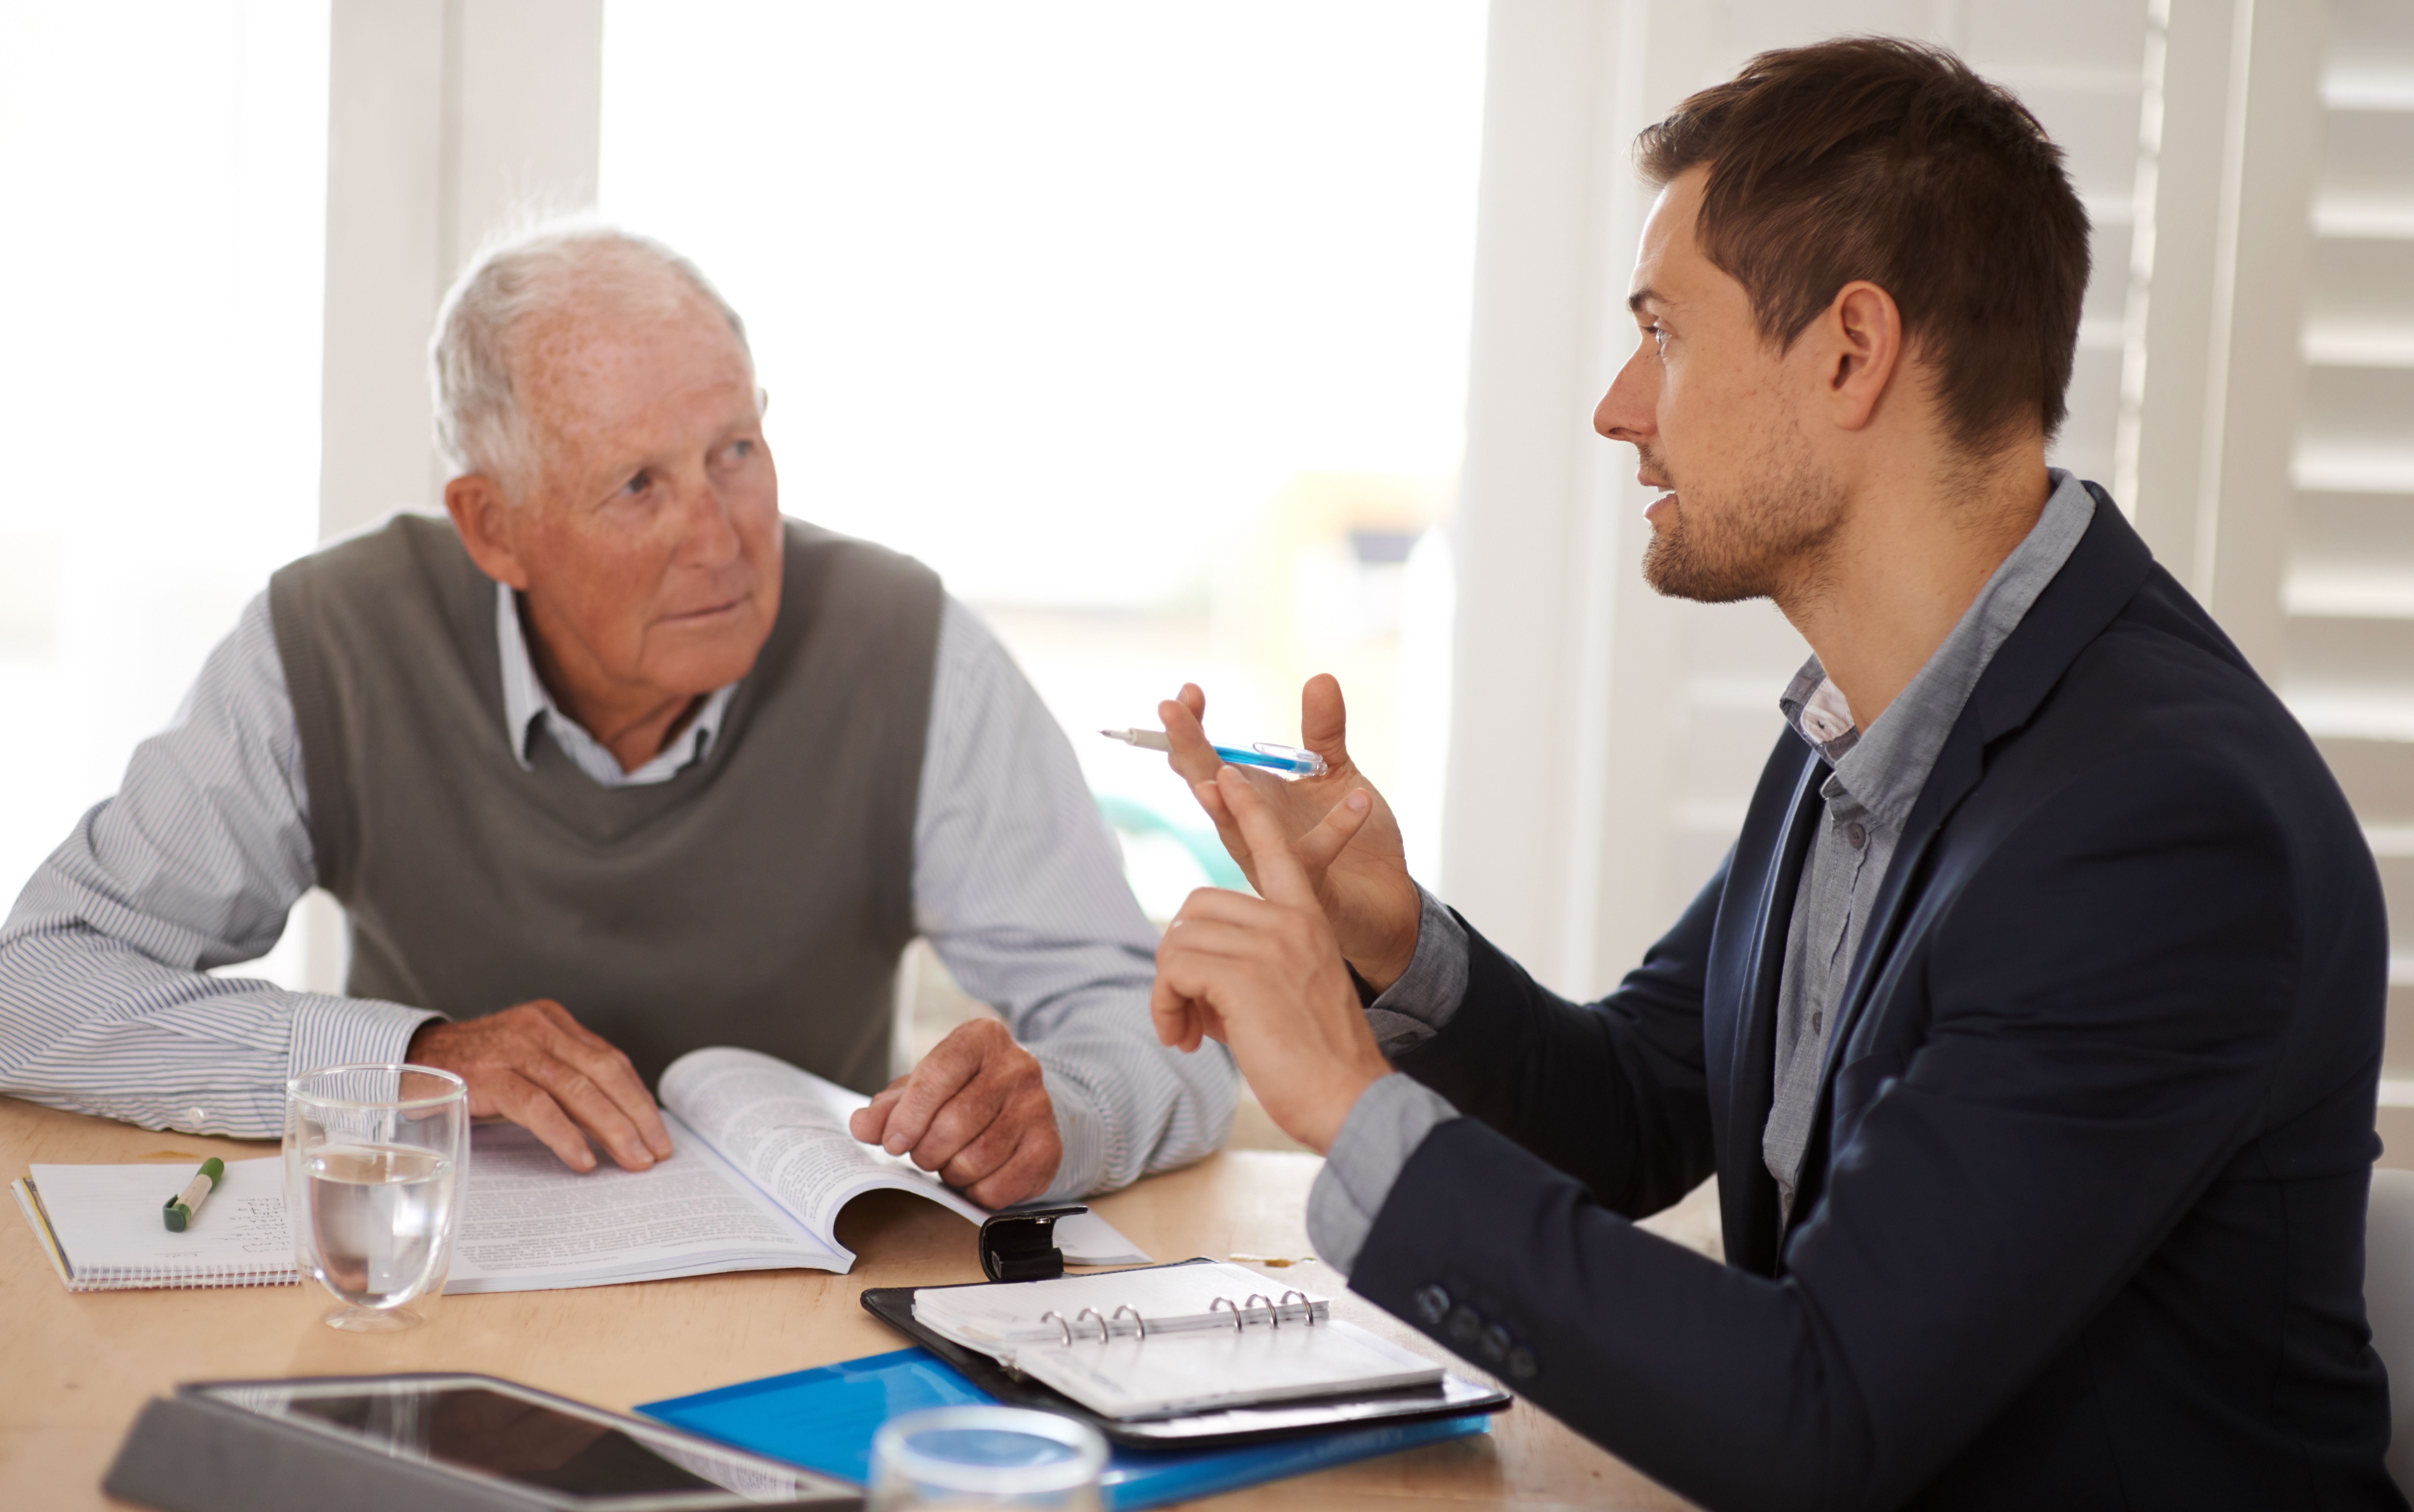 worksheet Nebraska Inheritance Tax Worksheet learn about nebraska inheritance tax laws what illinois residents should know estate taxes